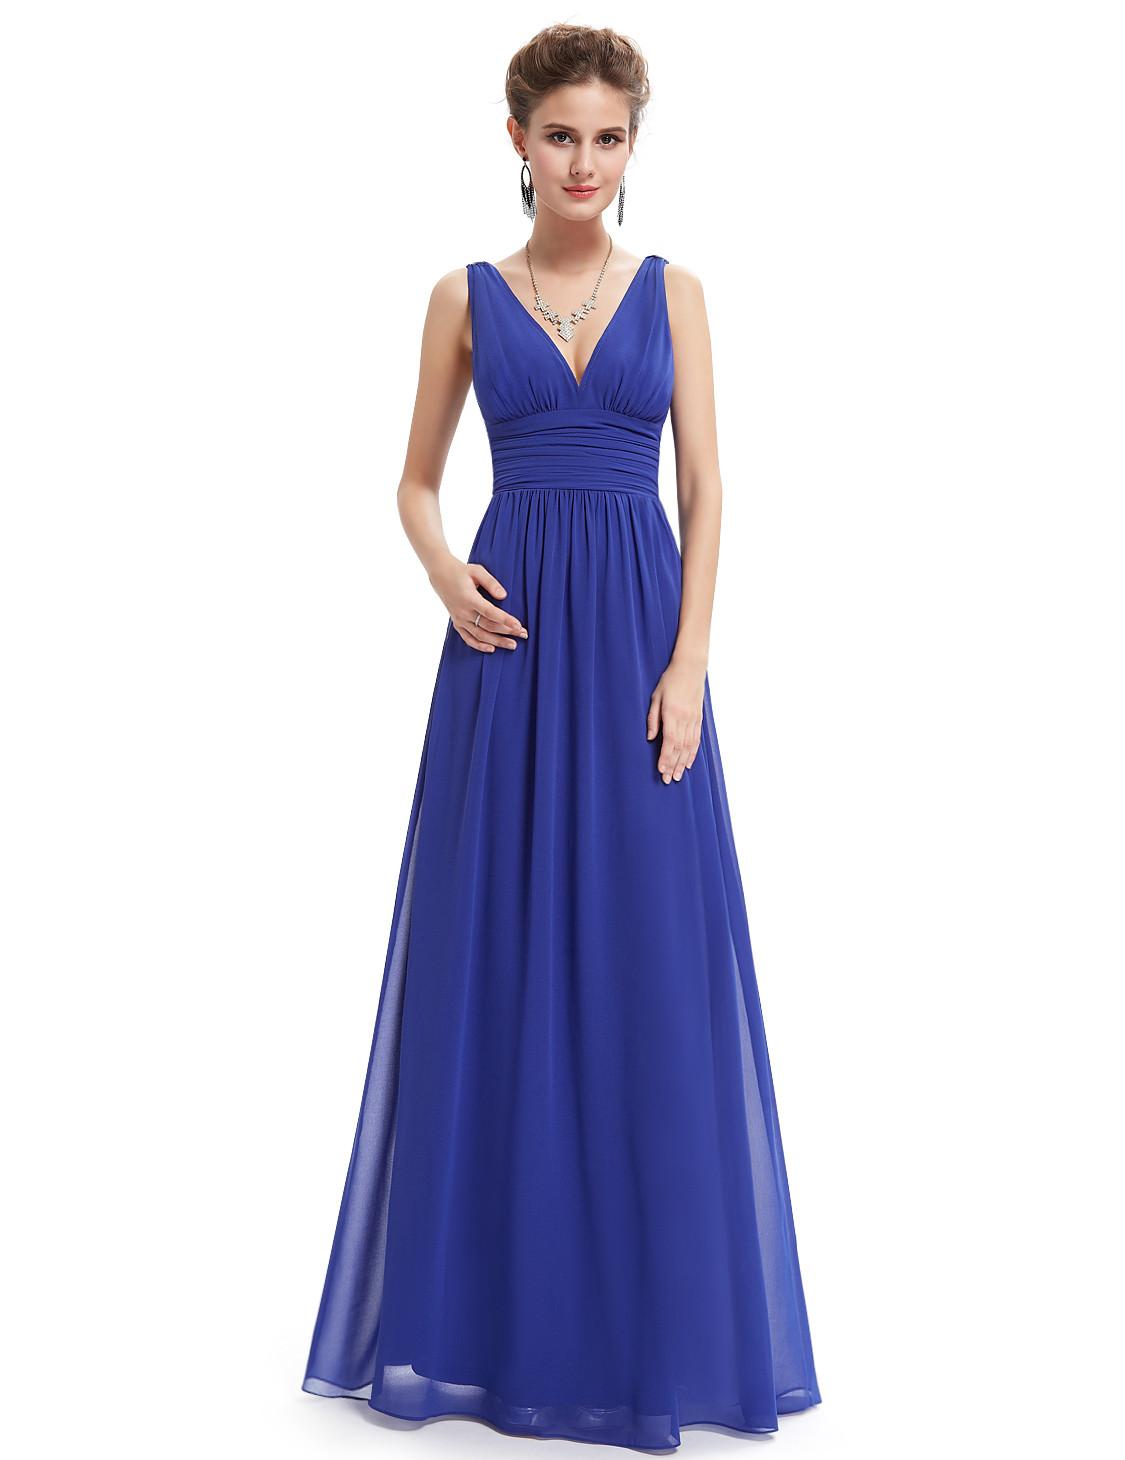 Elegant Double V Neck Blue Bridesmaid Dress